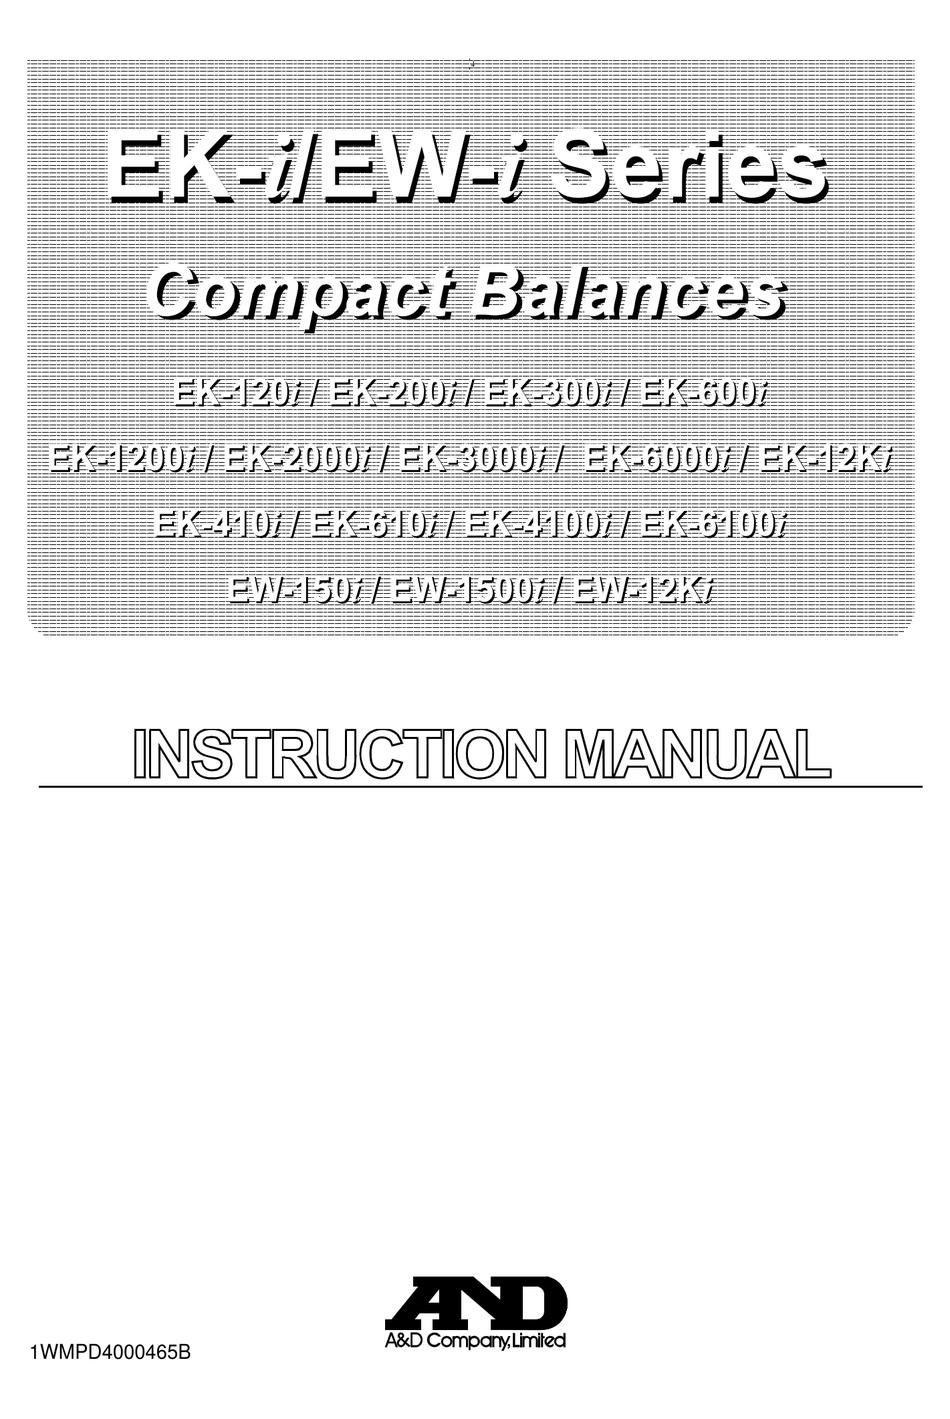 Industrial & Scientific A&D EK-6000i EK-I Series Compact Balance ...